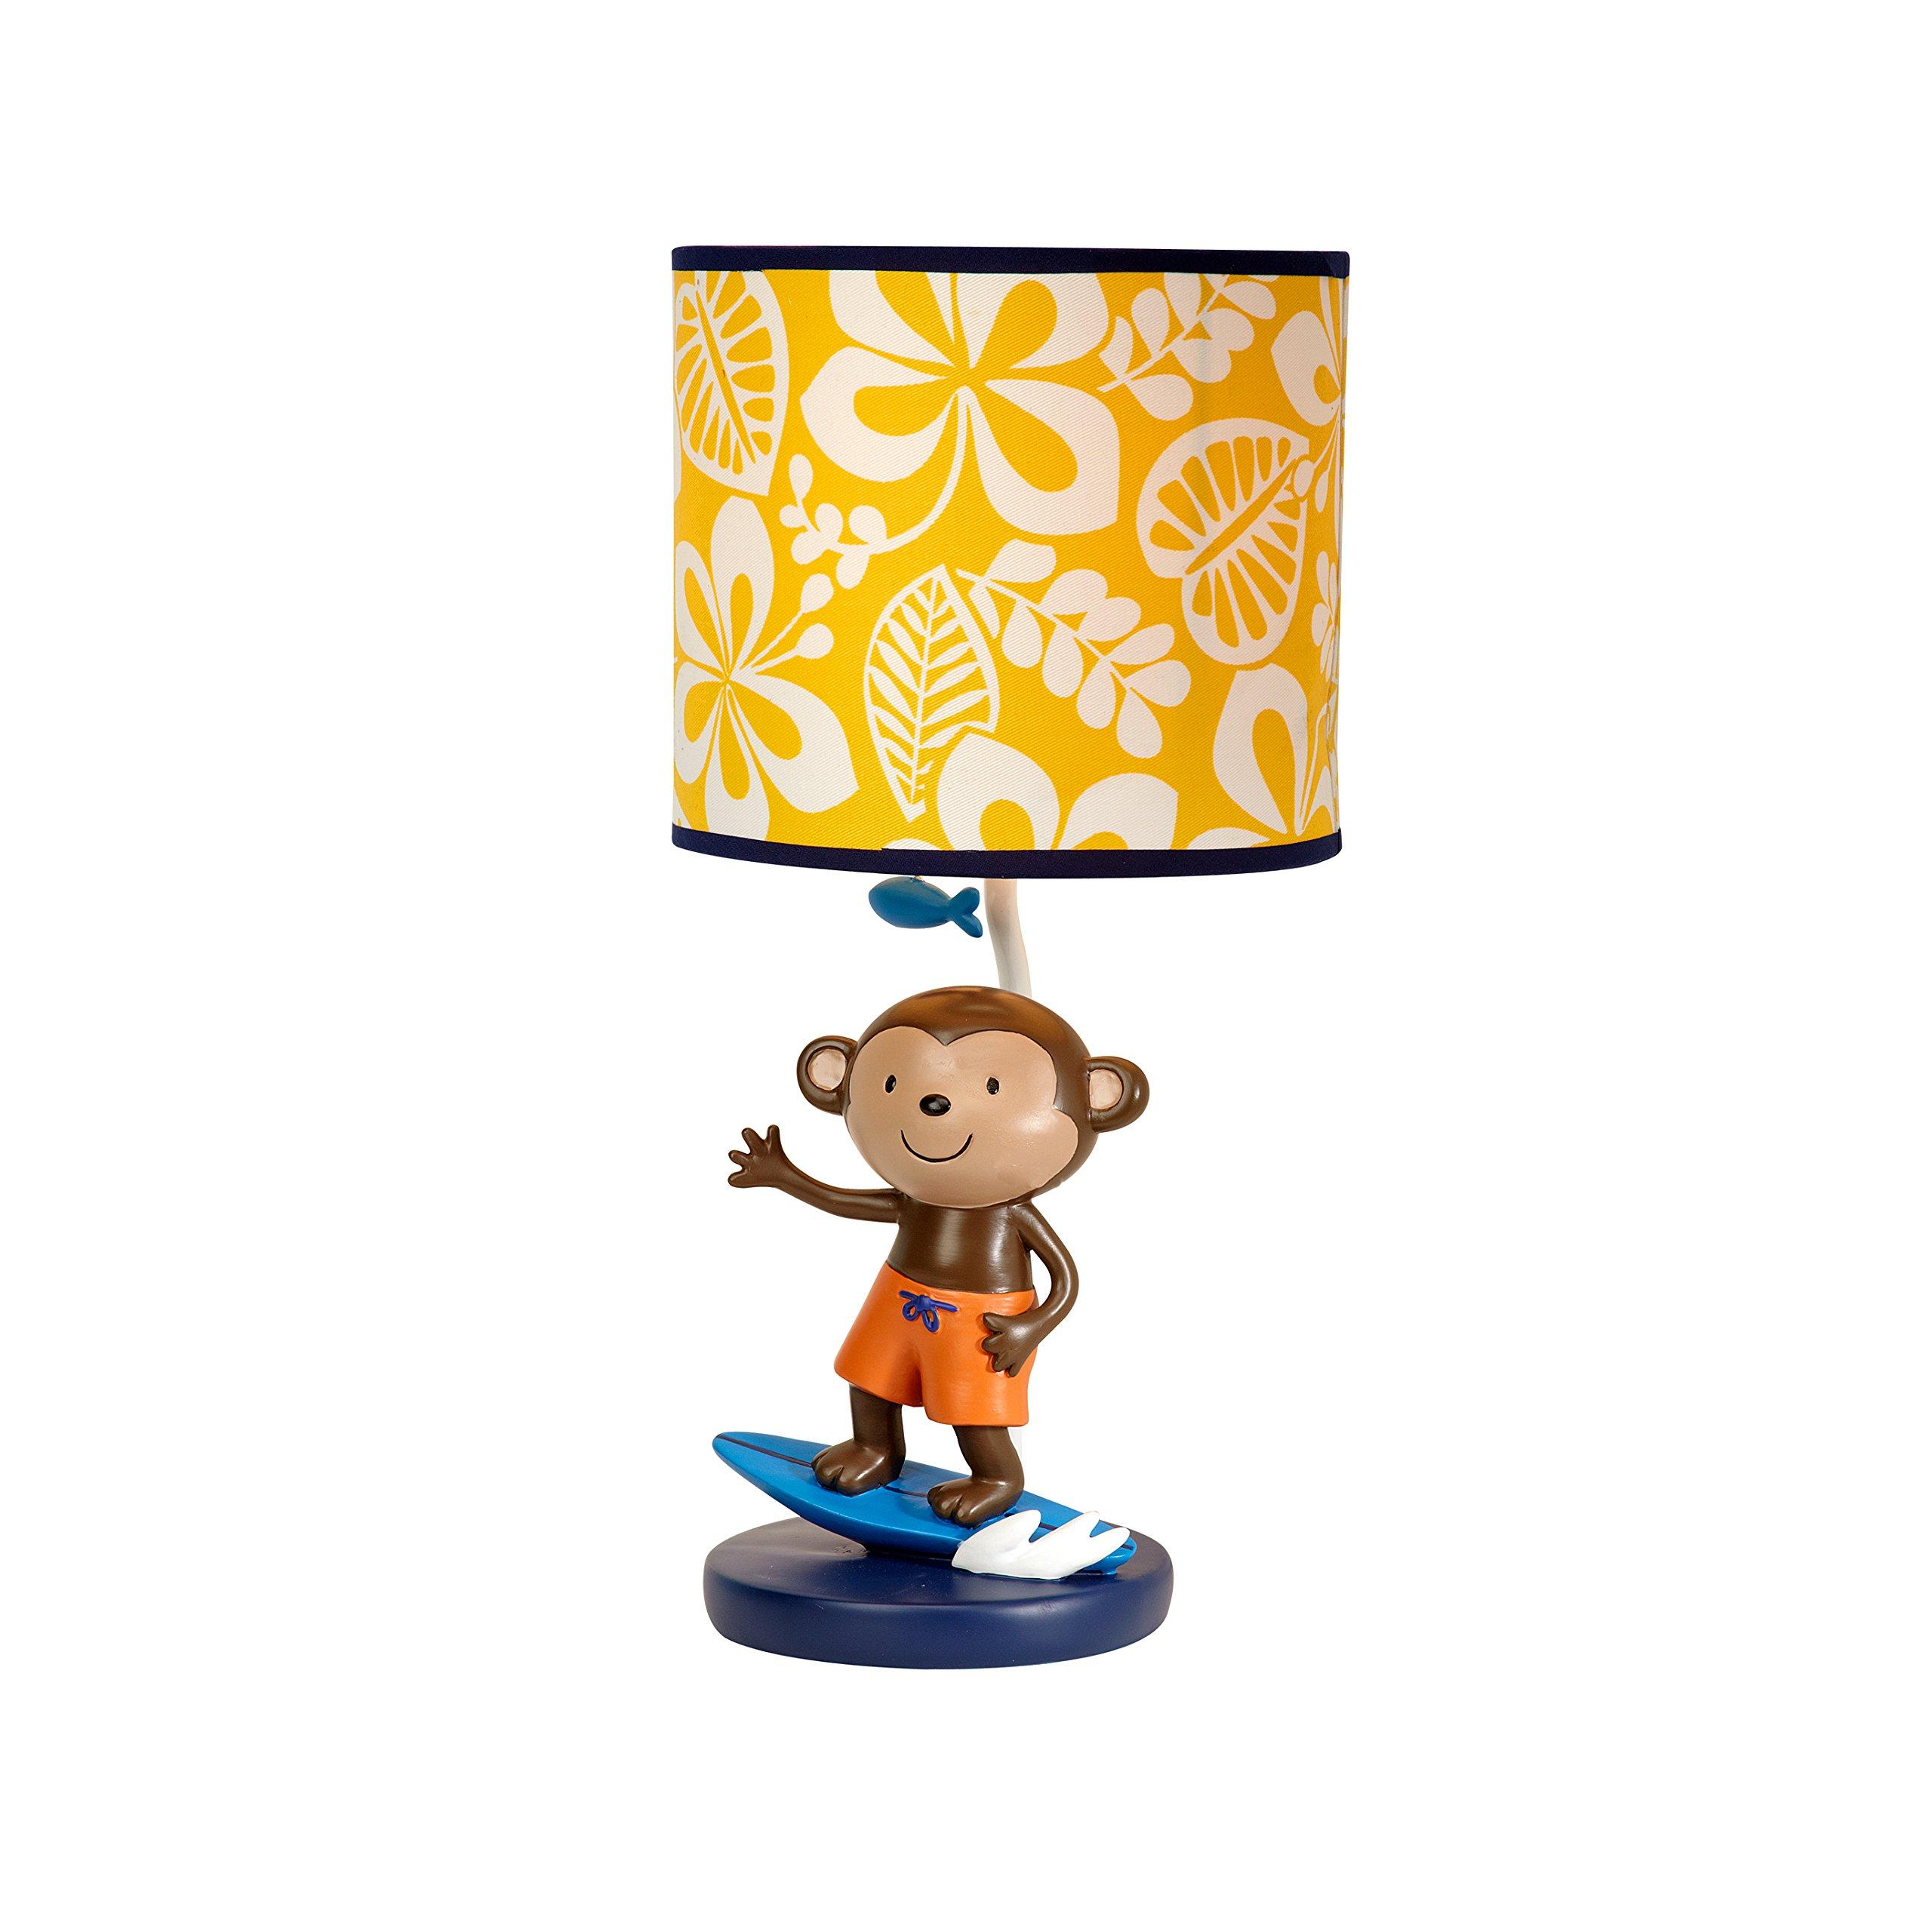 Carter's Laguna Collection Lamp and Shade